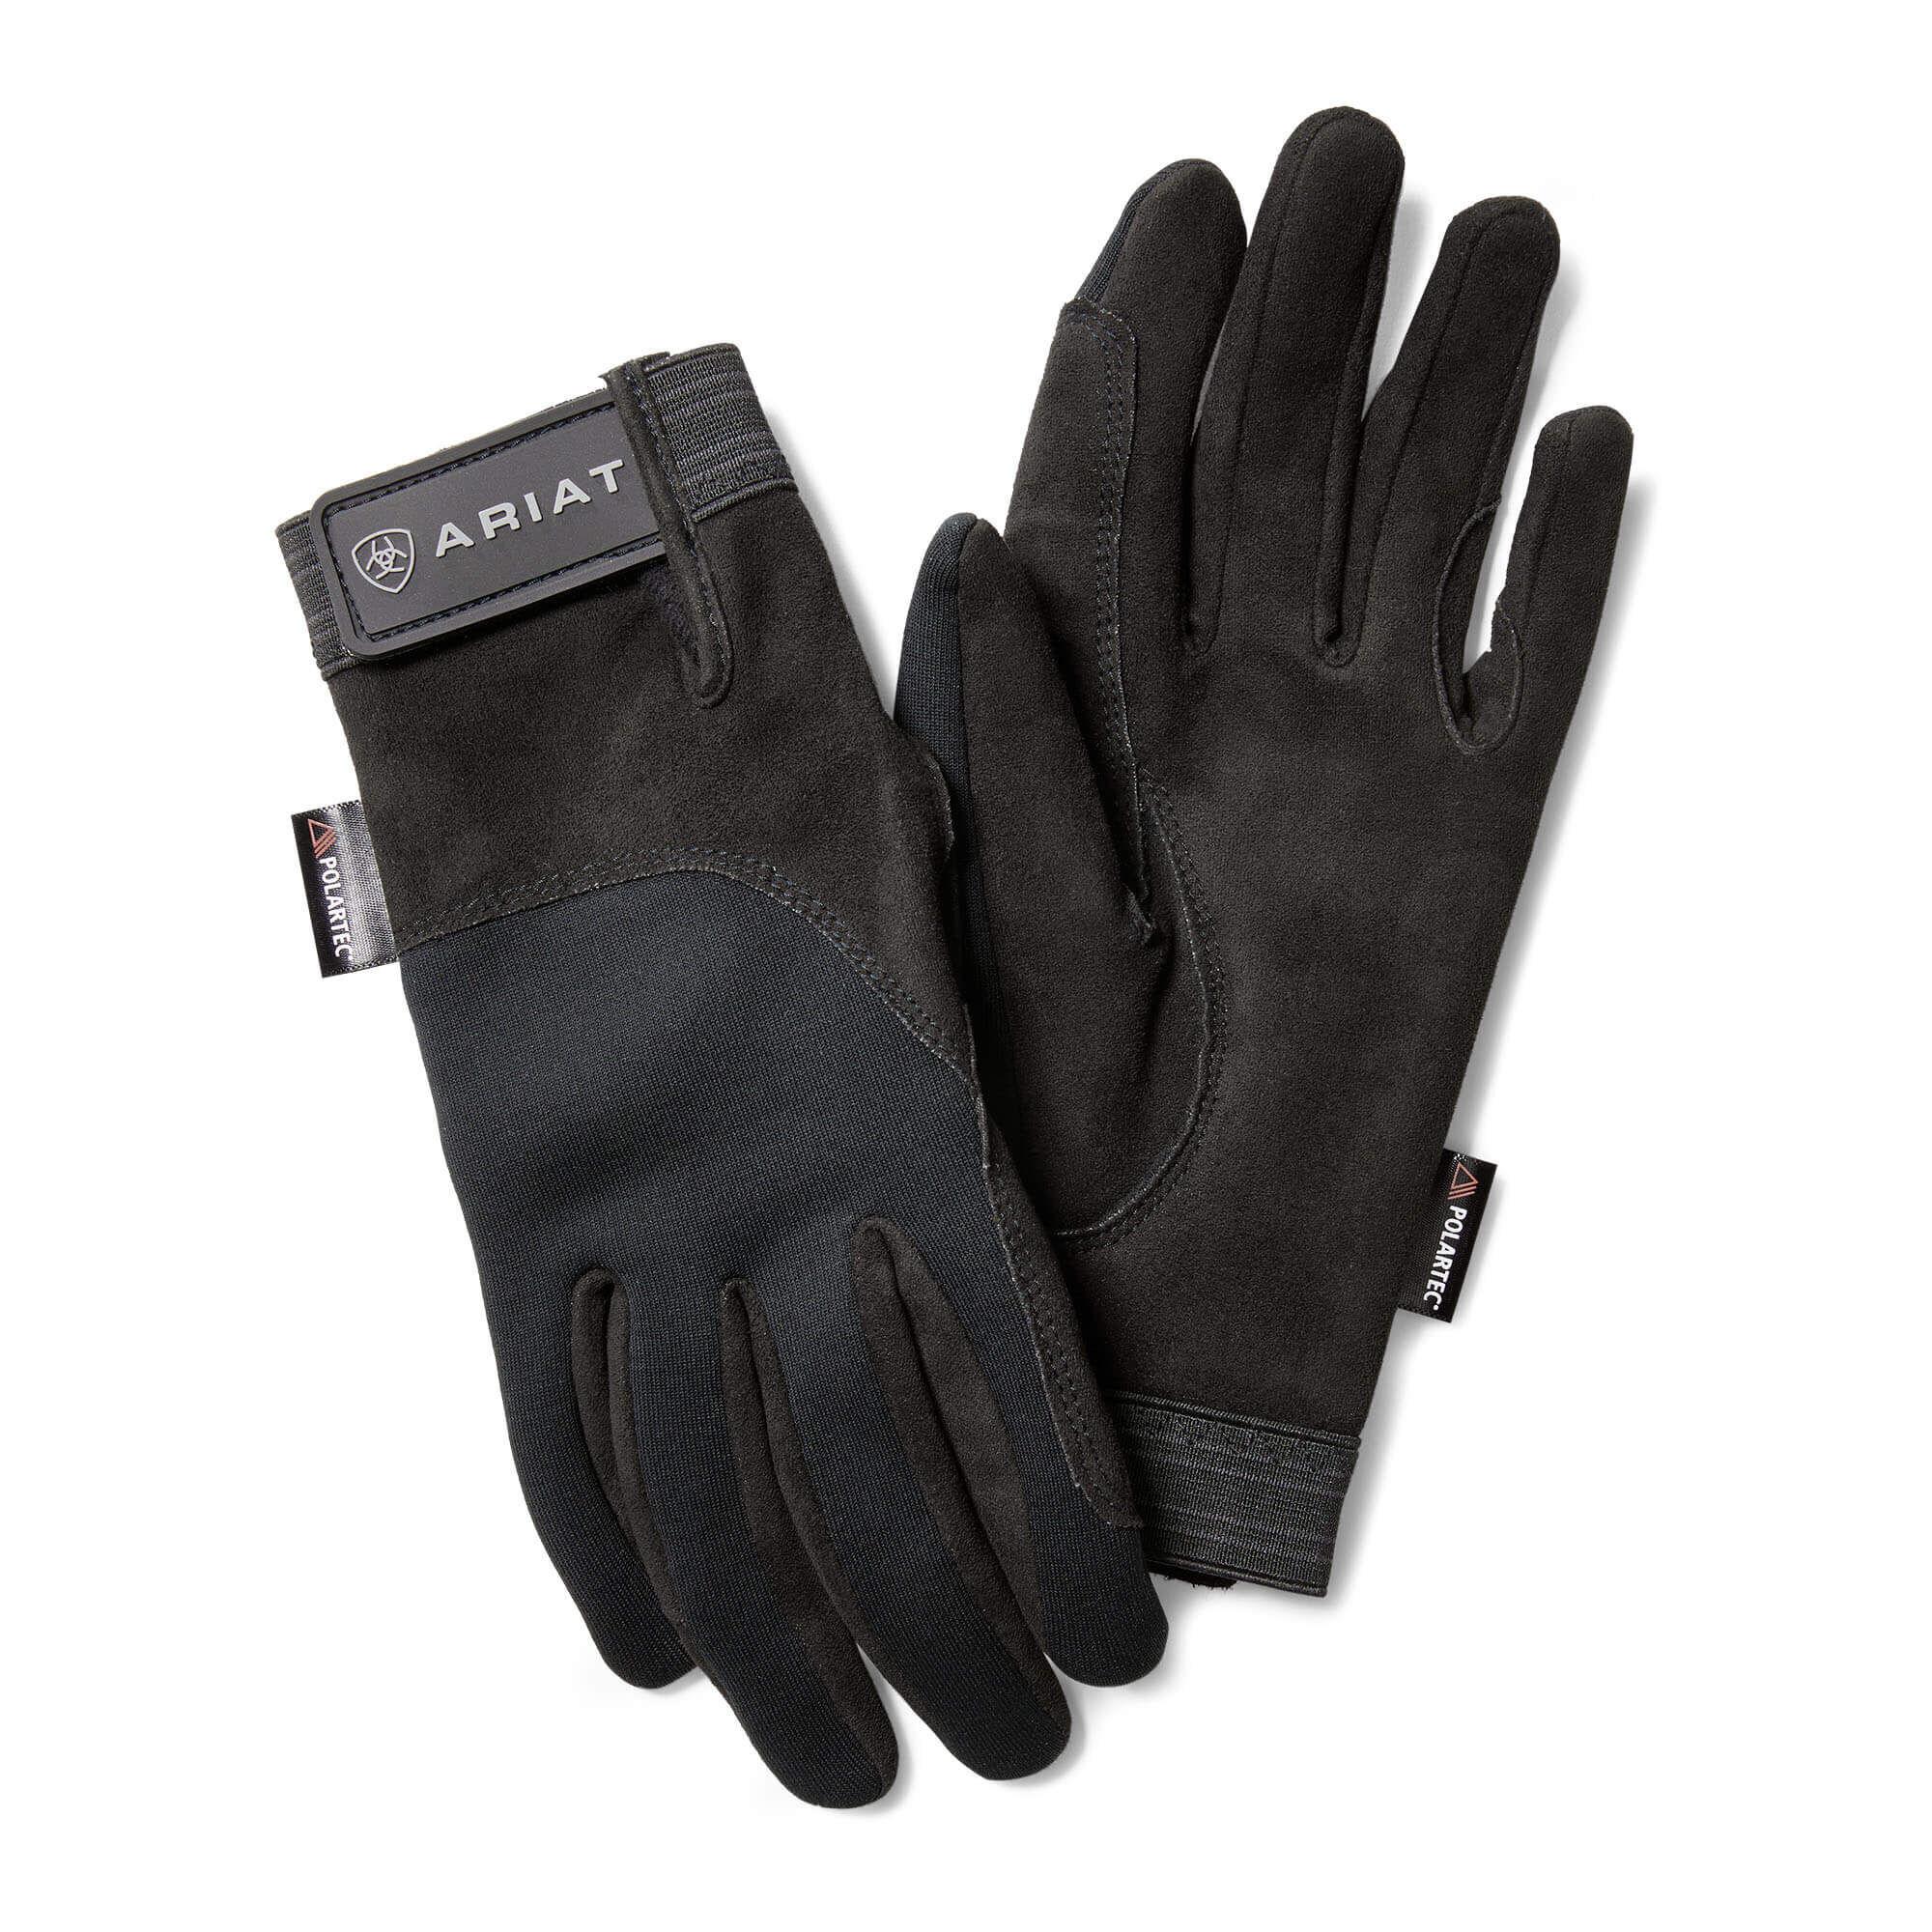 Ariat Insulated Tek Grip Gloves in Black, Size 11 by Ariat